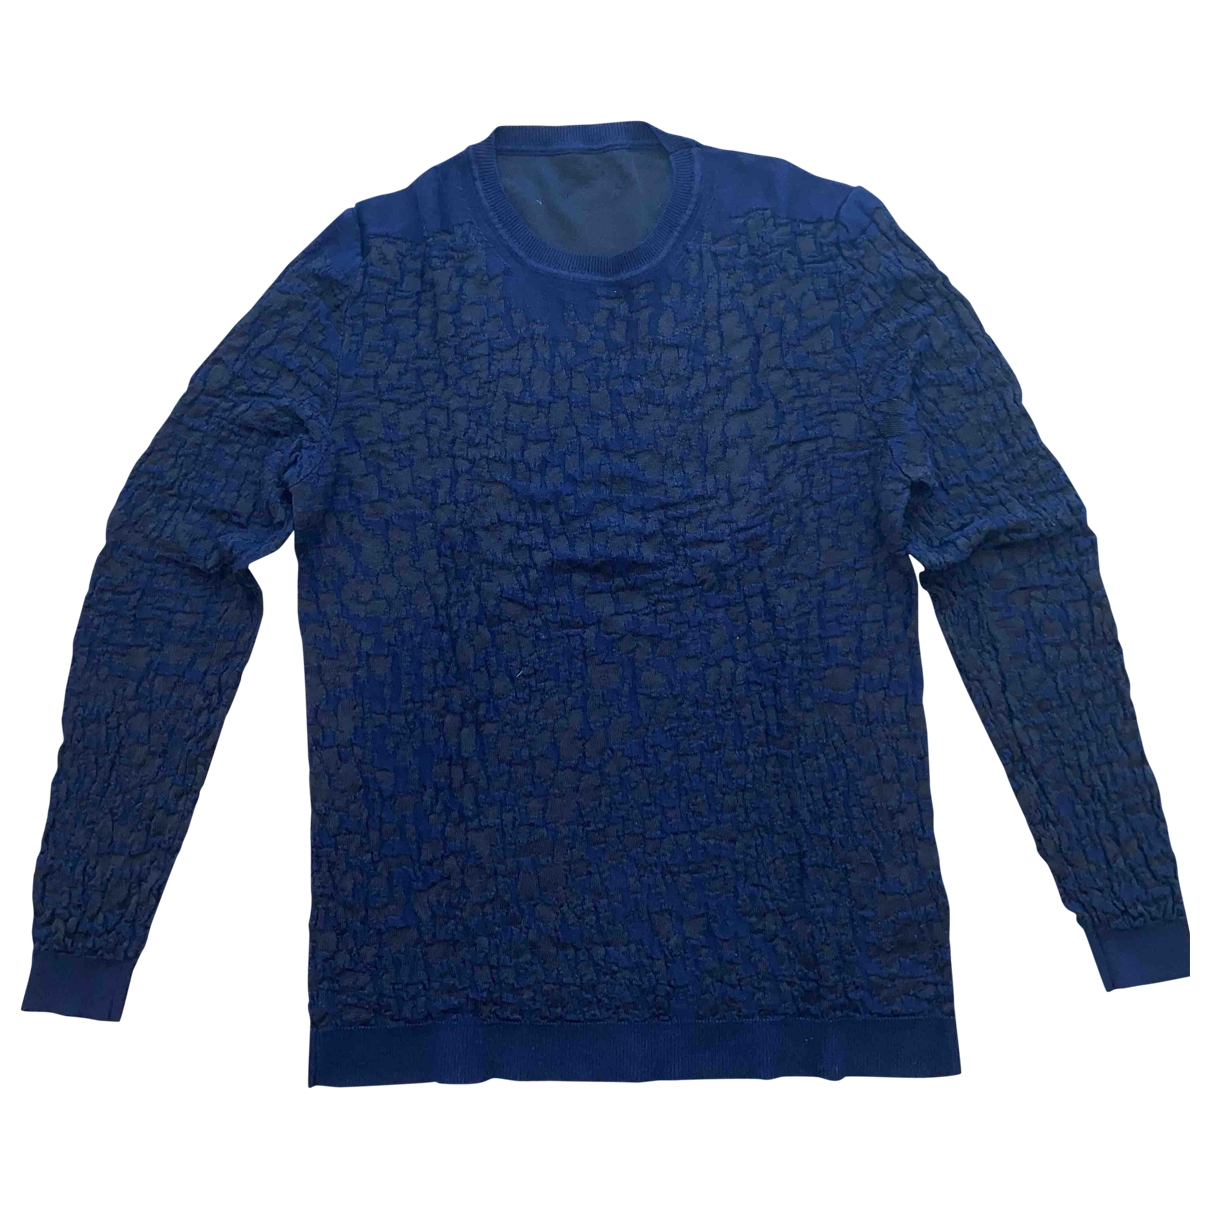 Just Cavalli \N Cashmere Knitwear & Sweatshirts for Men L International